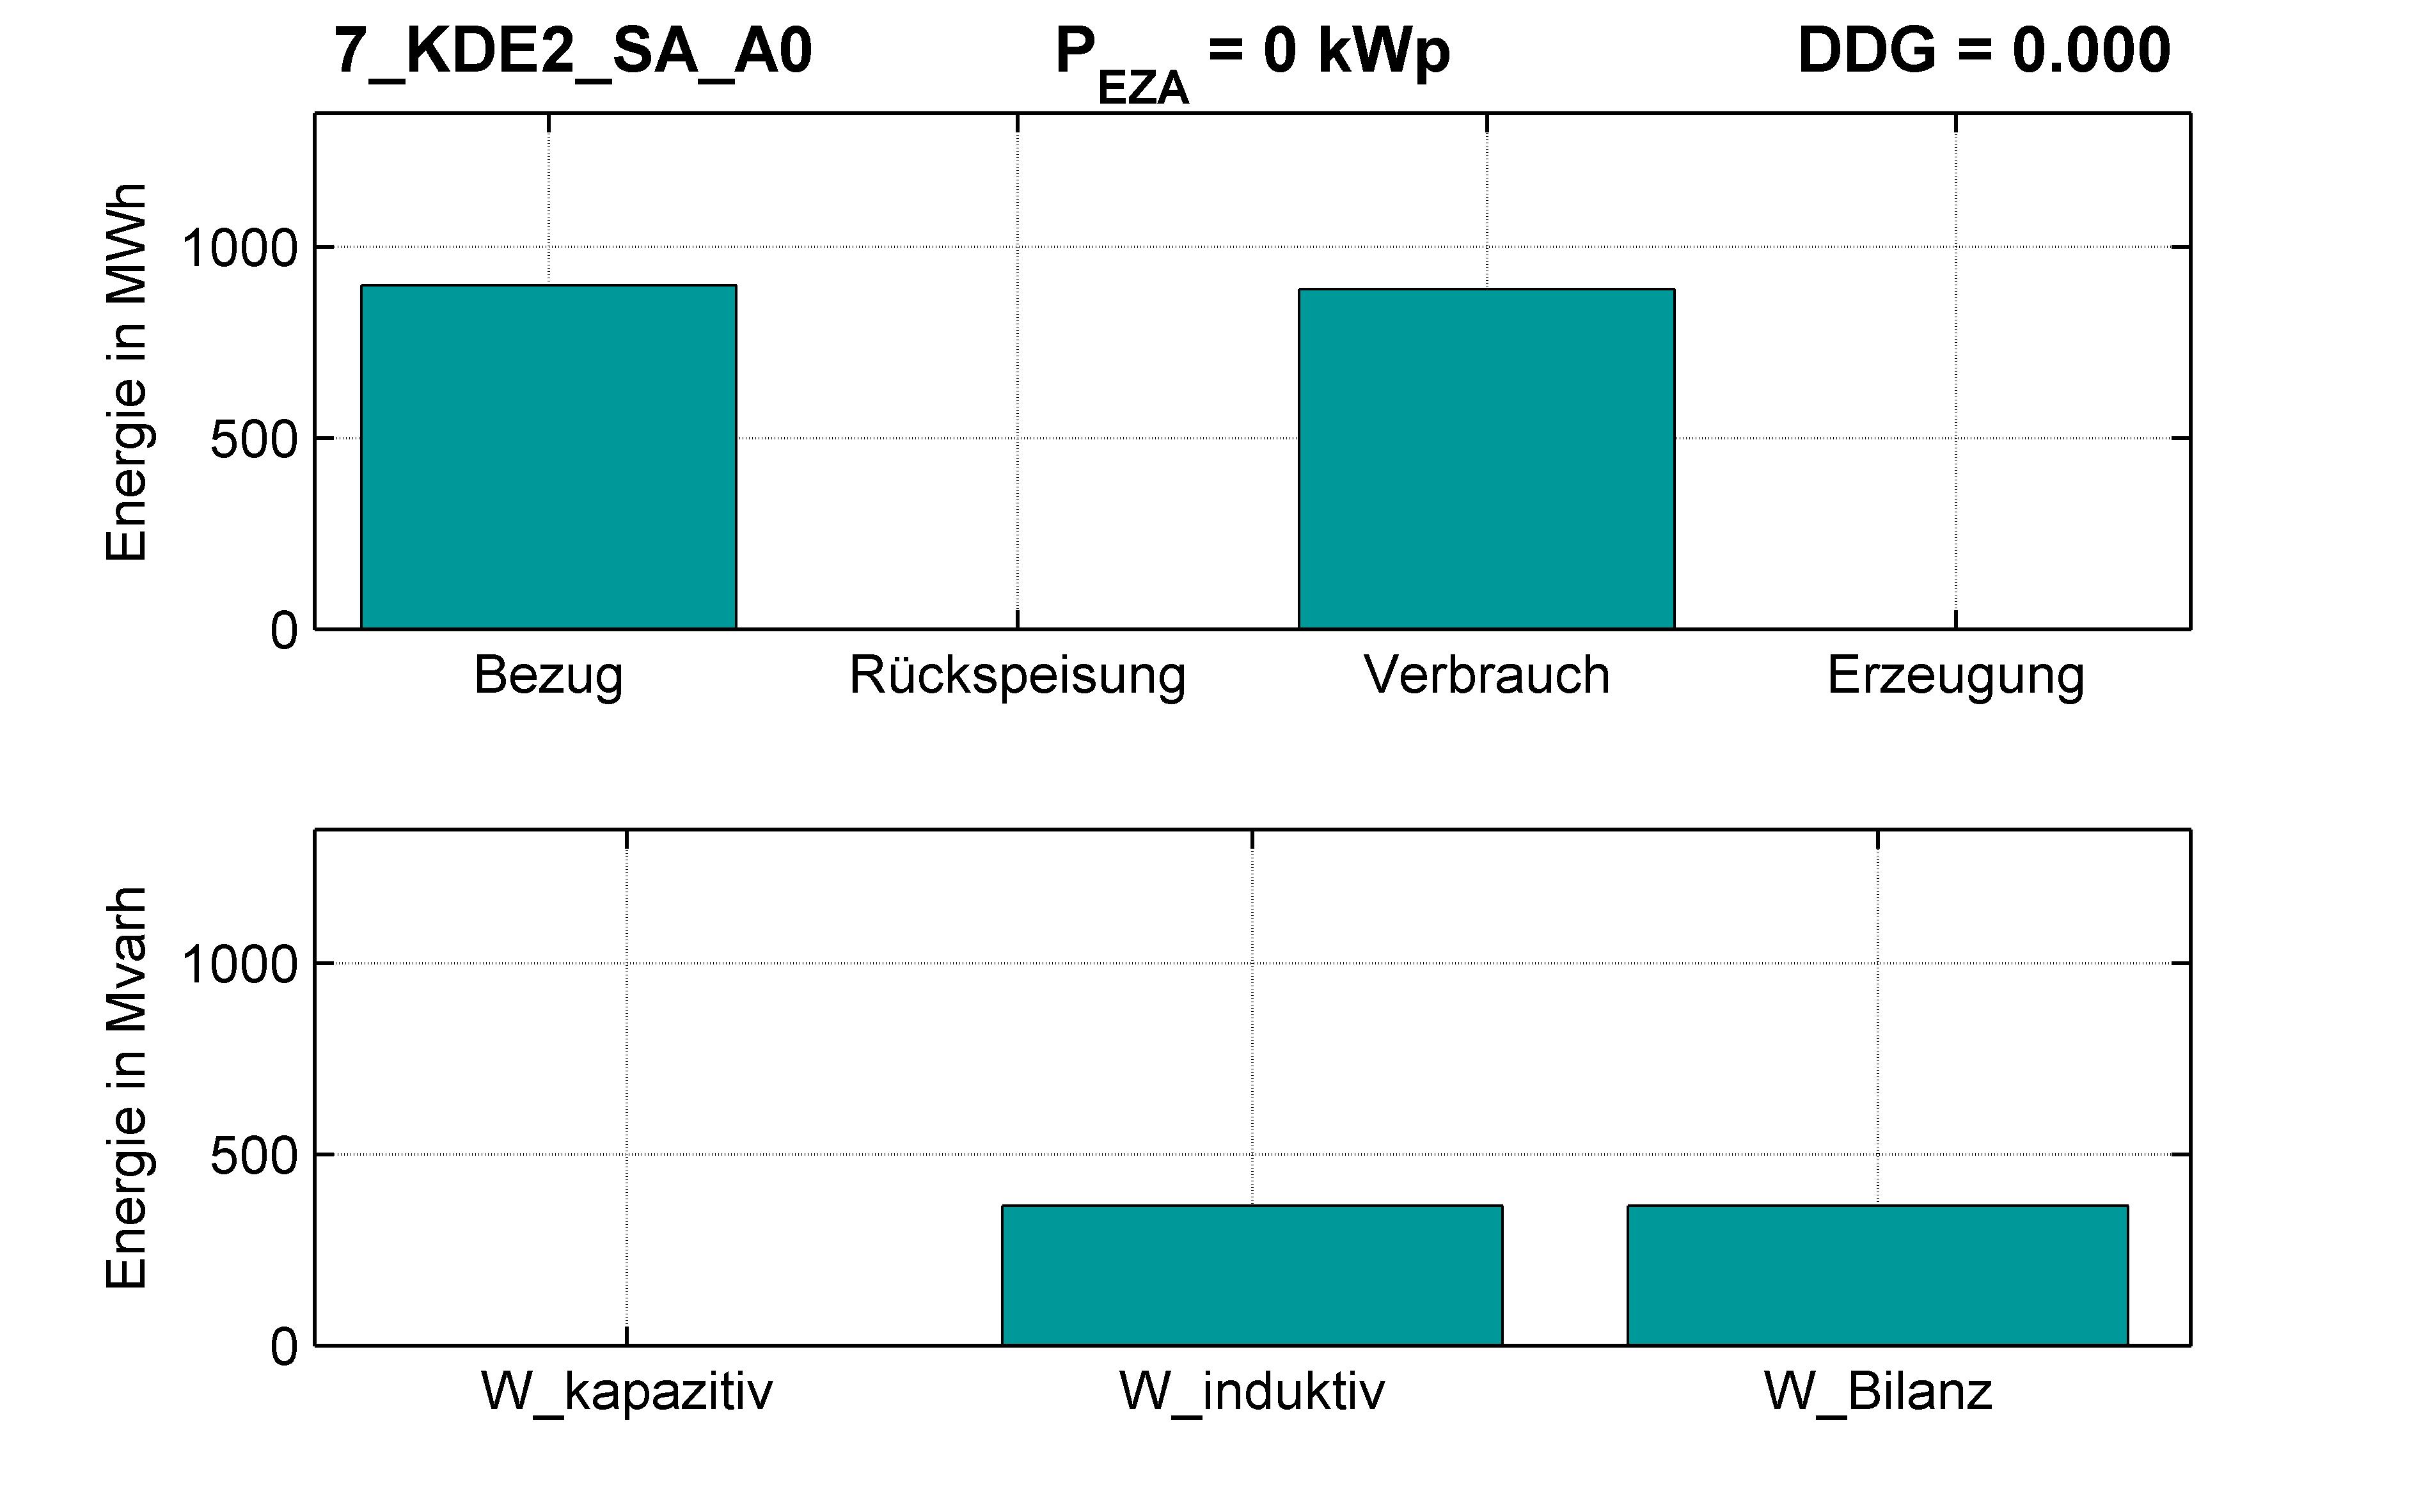 KDE2 | Längsregler (SA) A0 | PQ-Bilanz